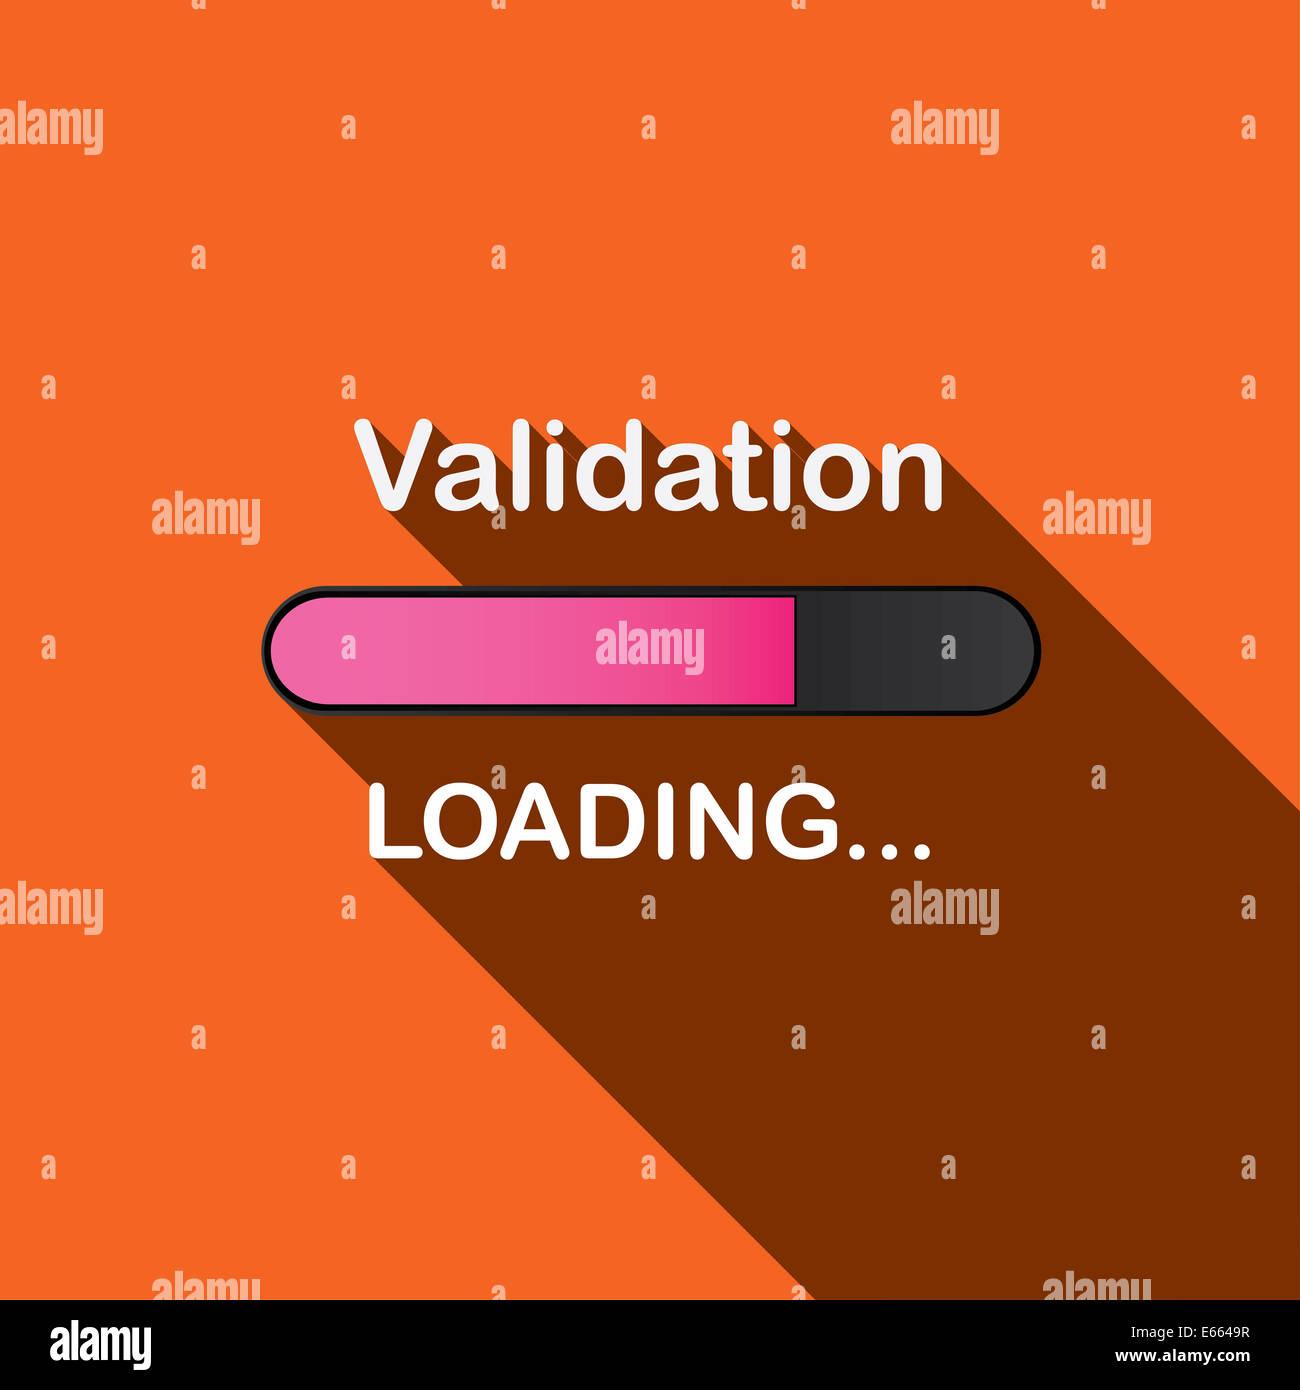 Long Shadow Loading Illustration - Validation - Stock Image